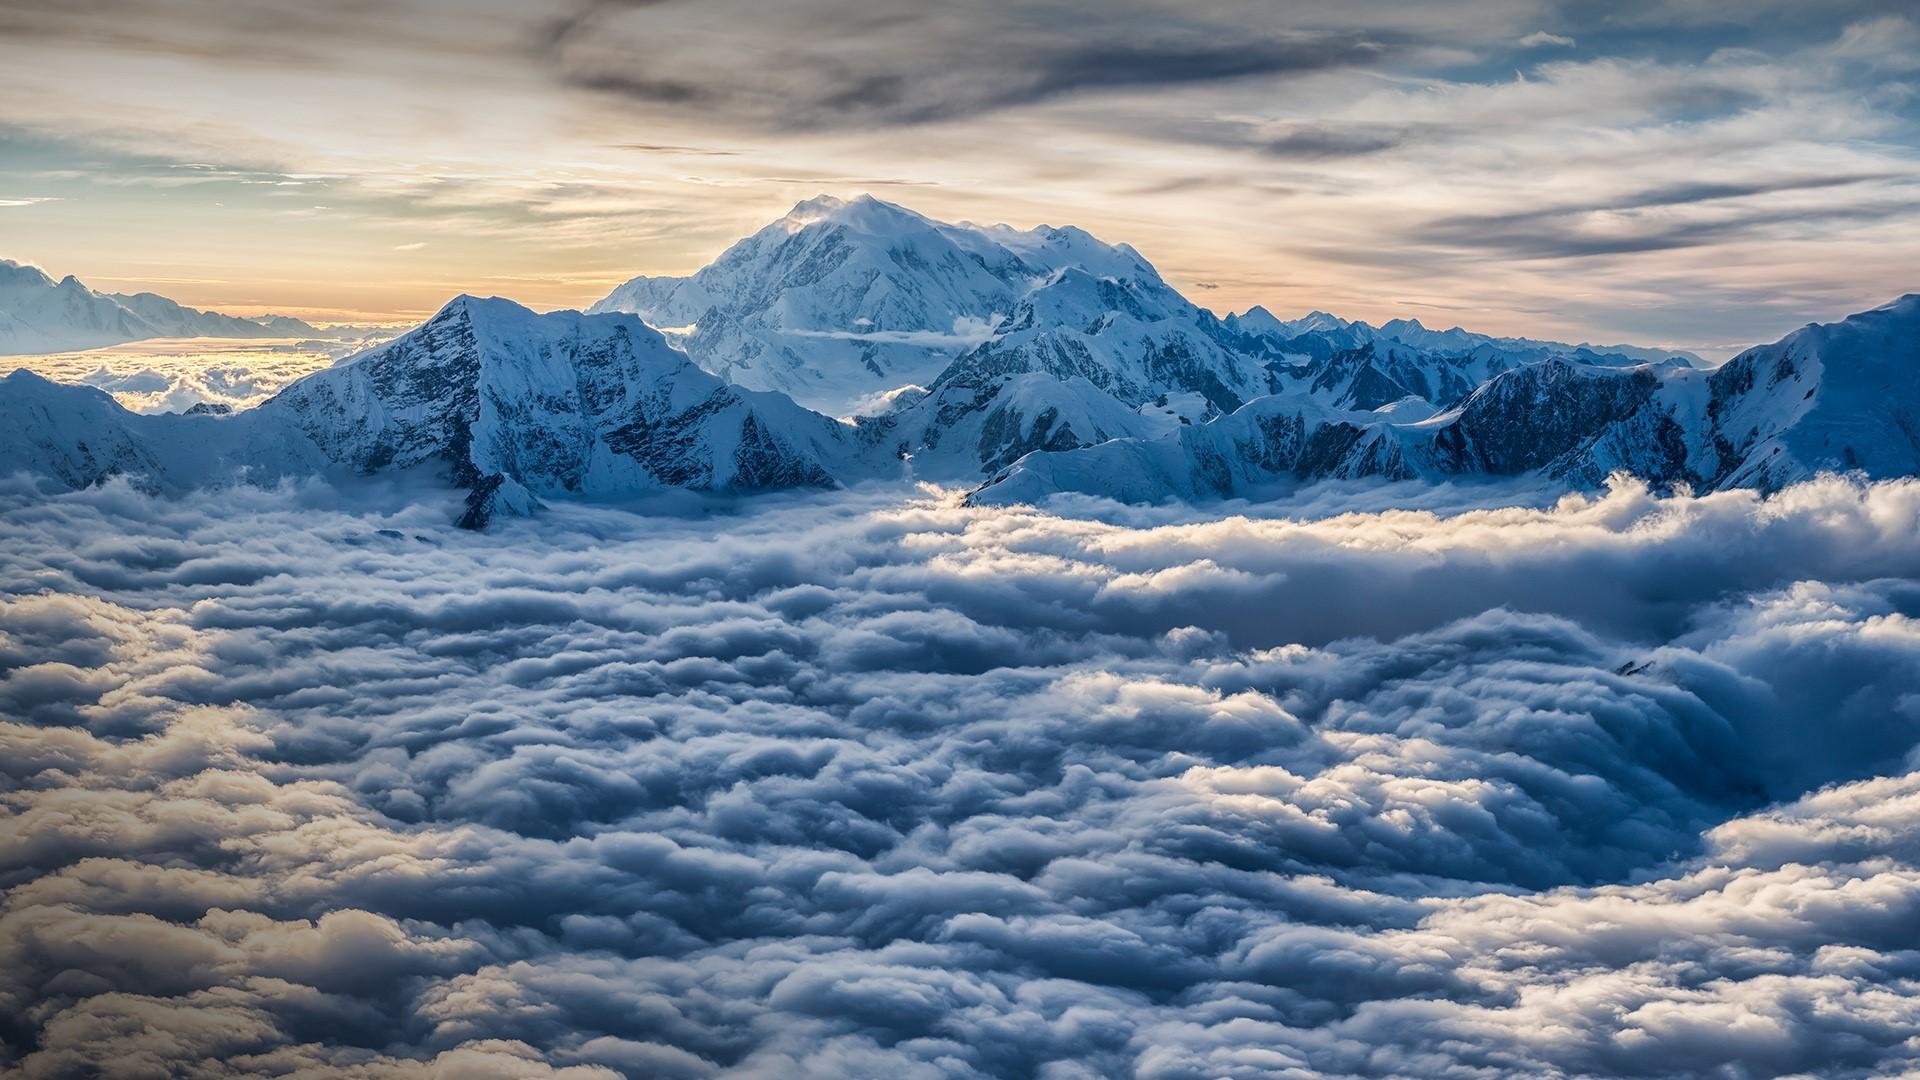 General 1920x1080 clouds sky mountains snowy mountain horizon Mount Logan Yukon Canada Kluane National Park and Reserve